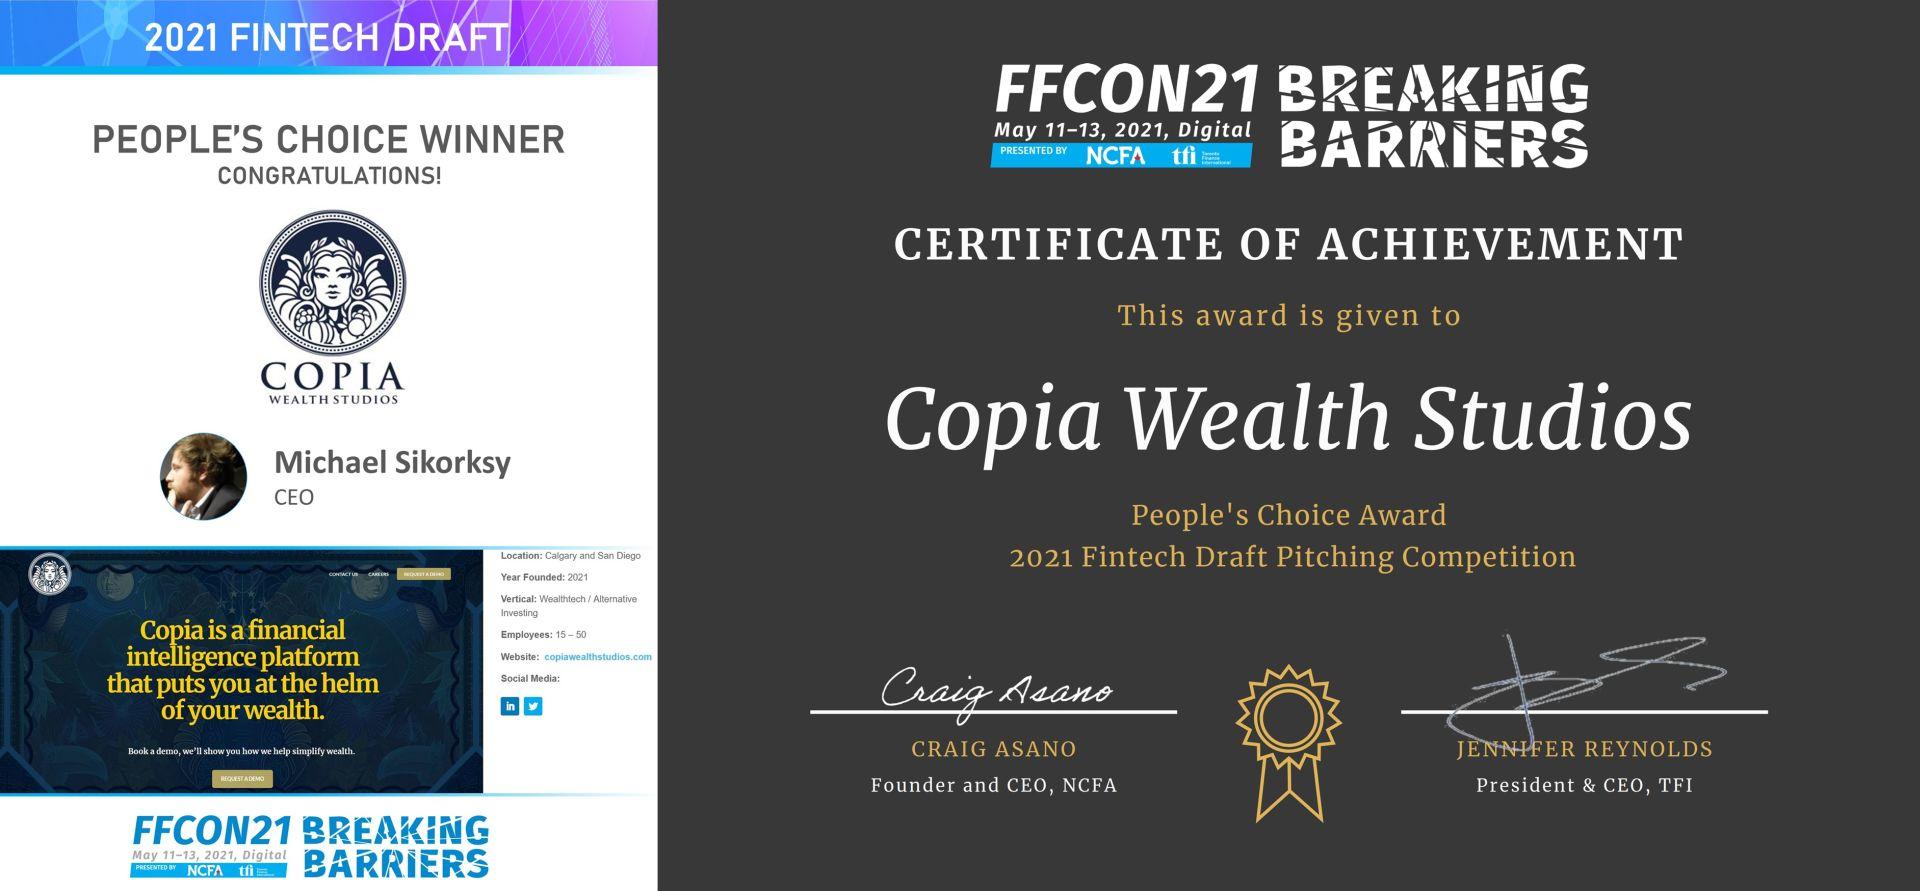 FFCON 2021 Fintech Draft People's Choice Winner - Copia Wealth Studios